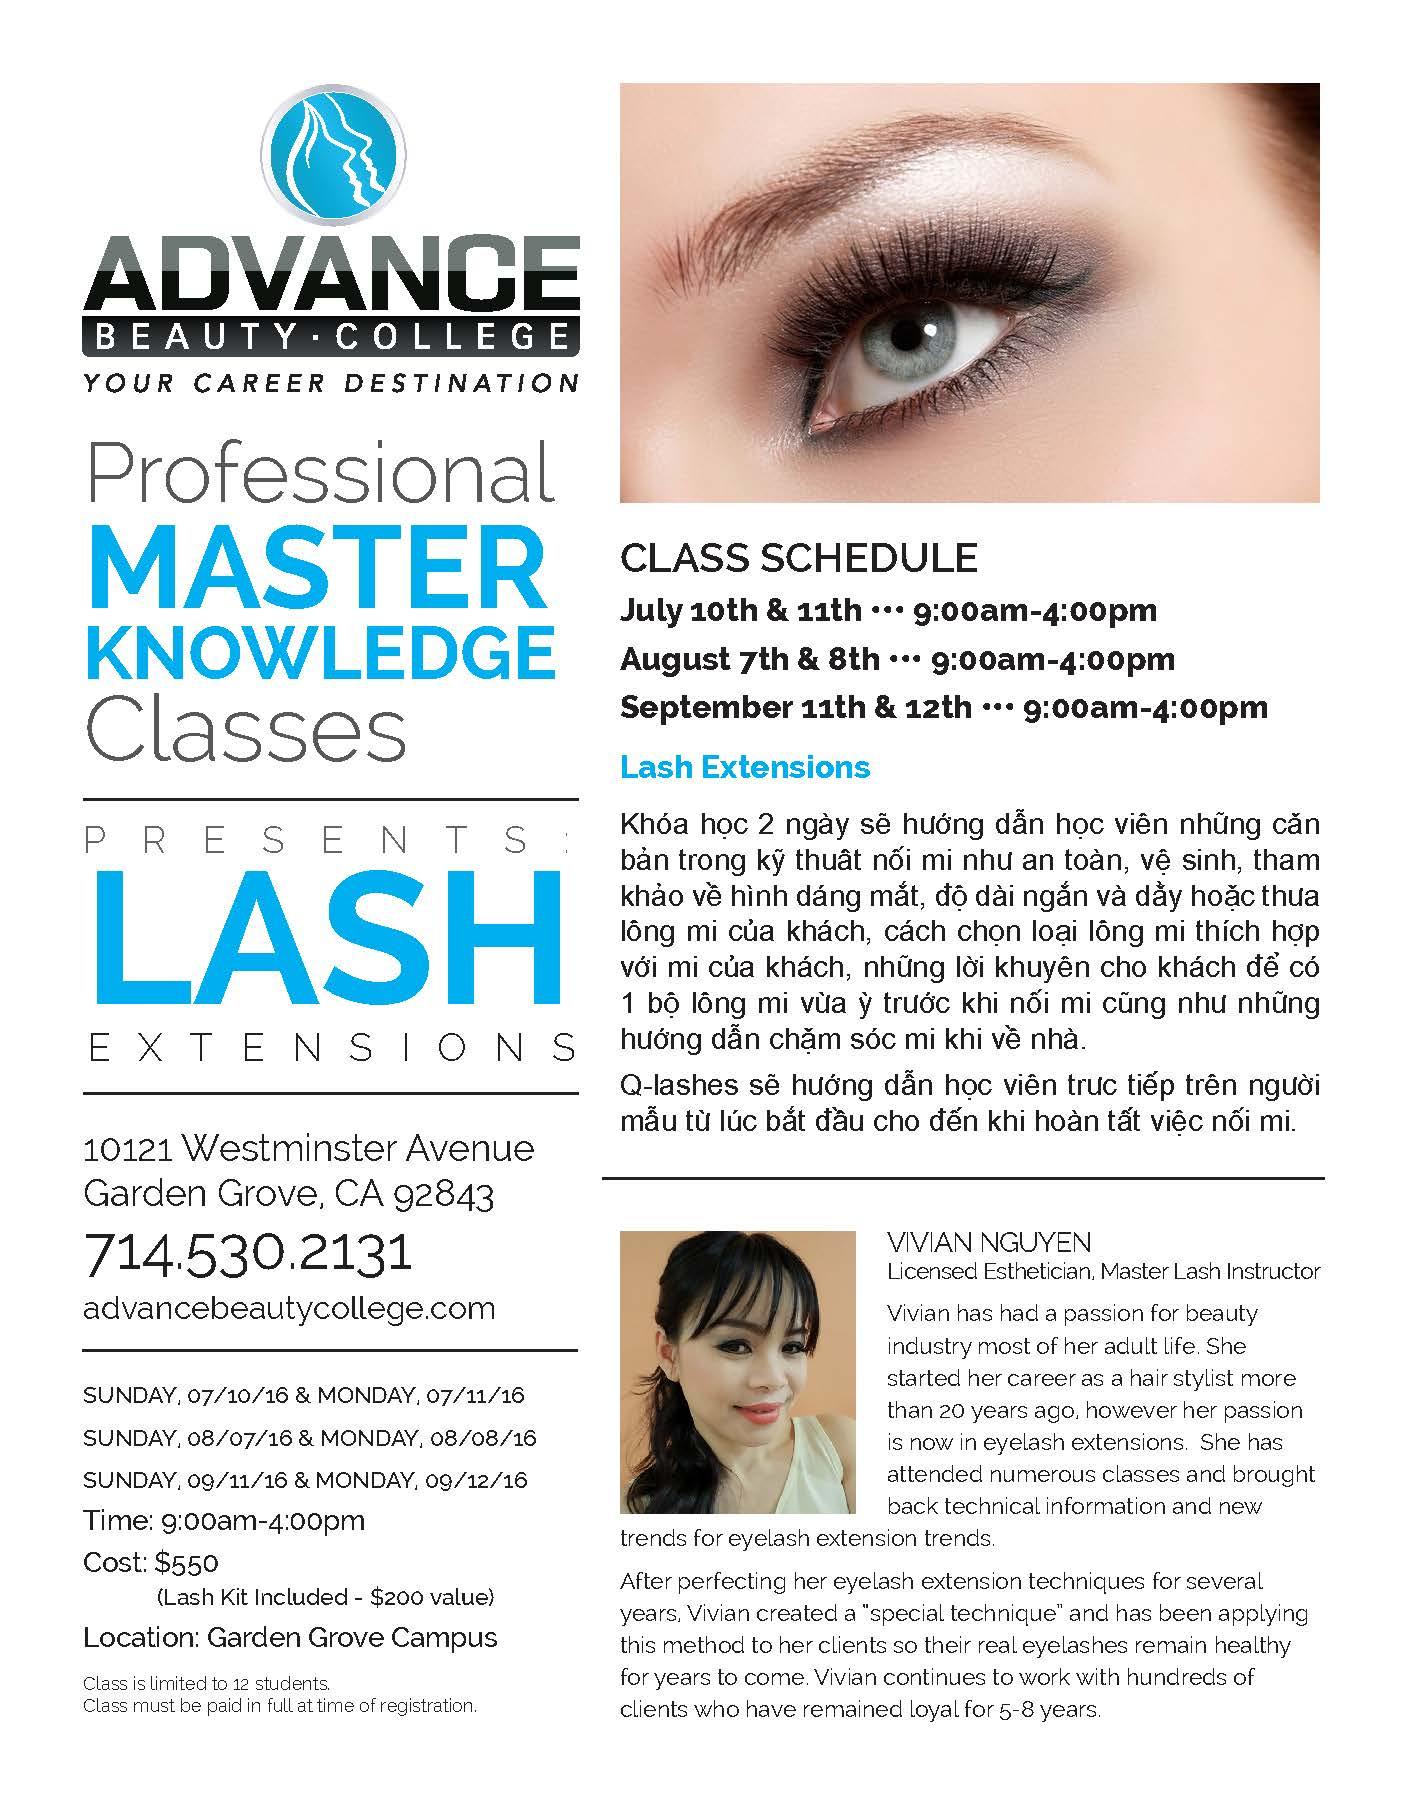 ABC_LH_MasterClass_EyelashEx_Vivian_JulAugSept_viet_flyer